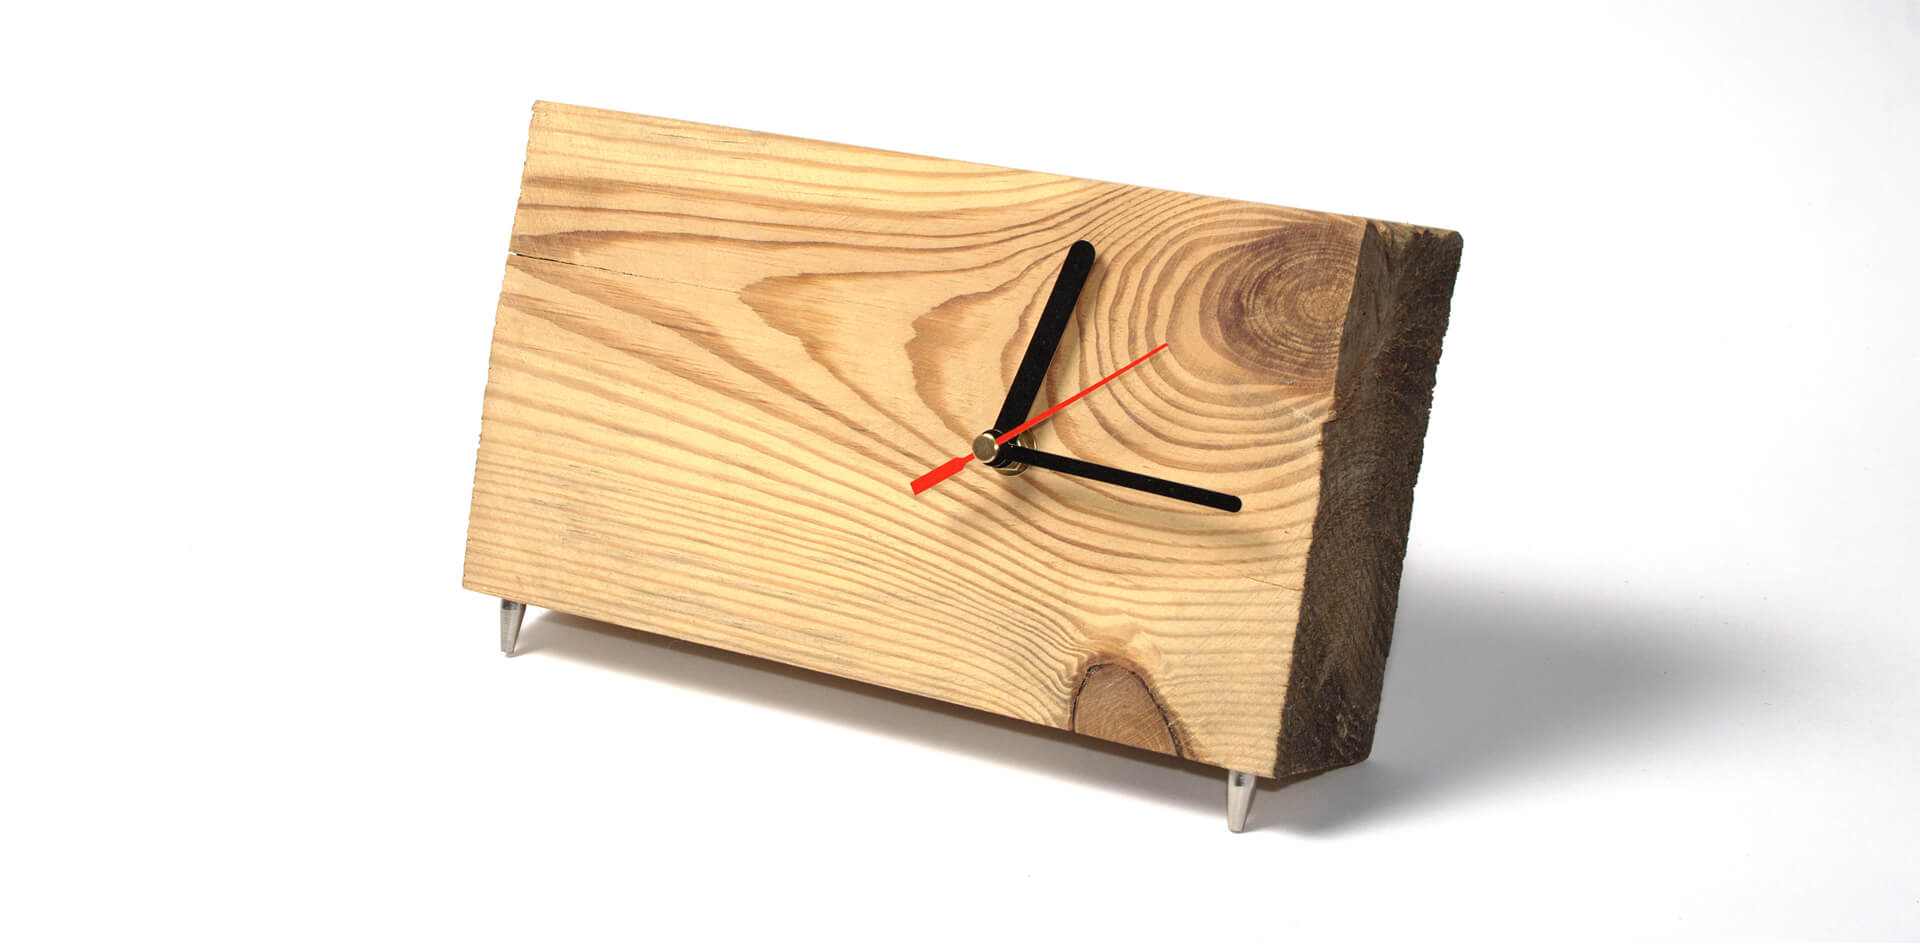 woodpecker_clock_new_01